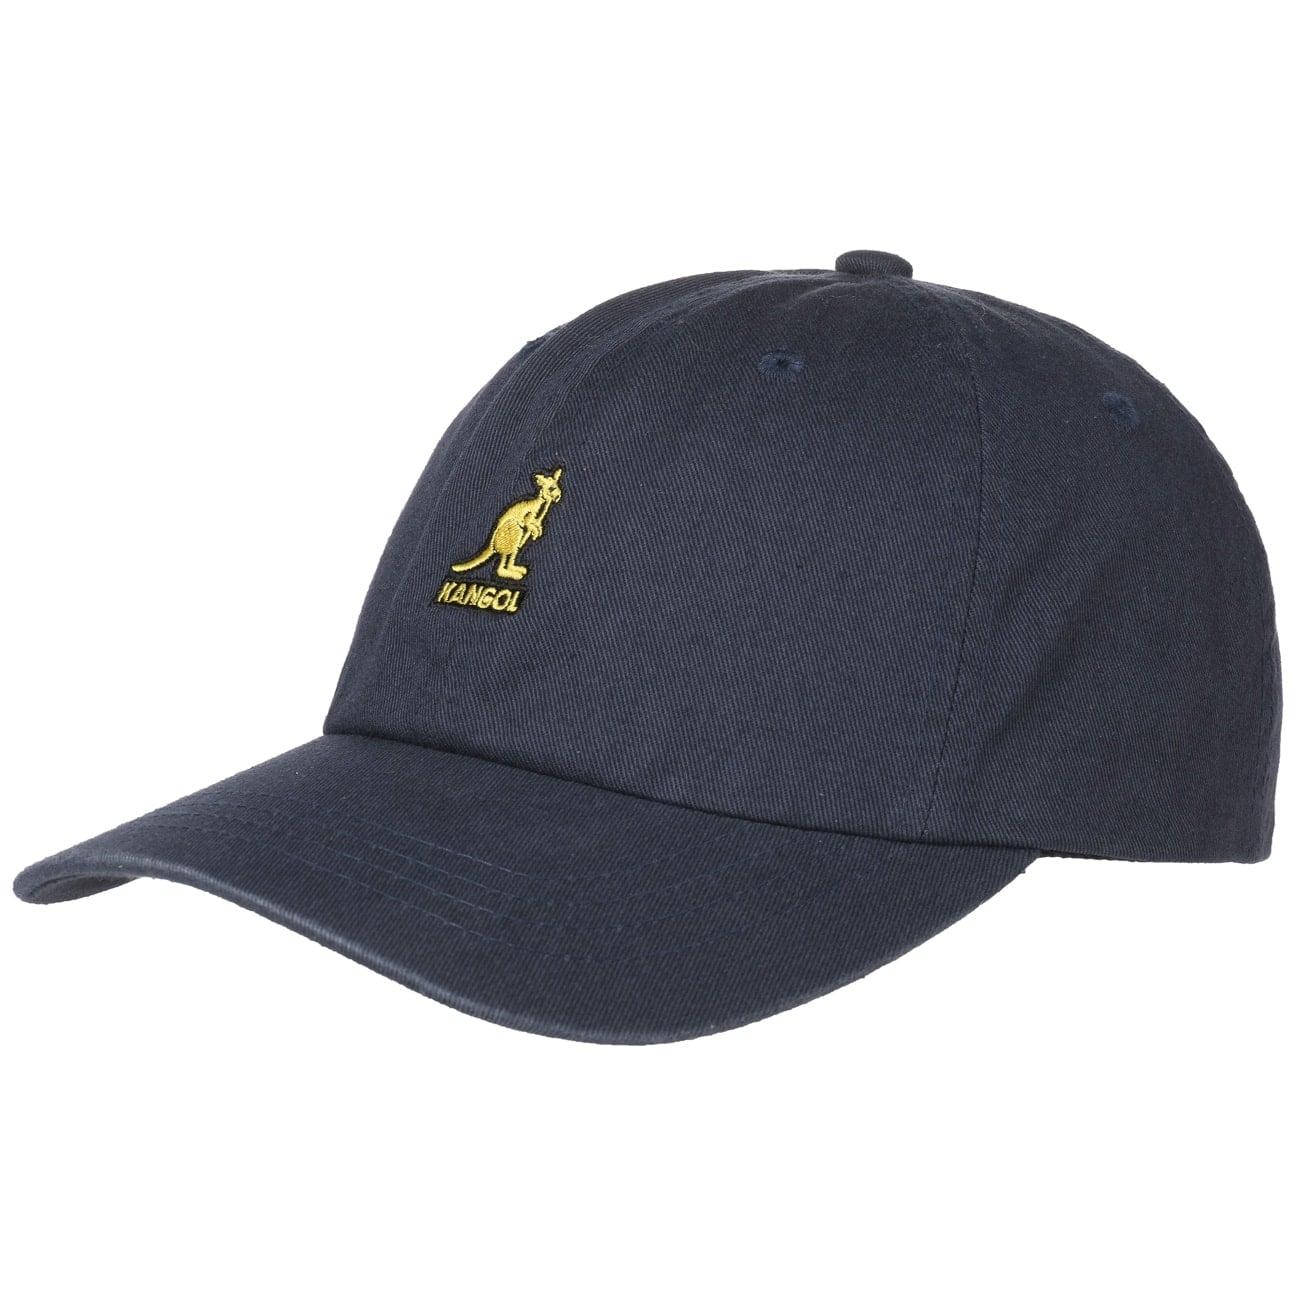 Gorra Washed Dad Hat by Kangol  gorra de baseball